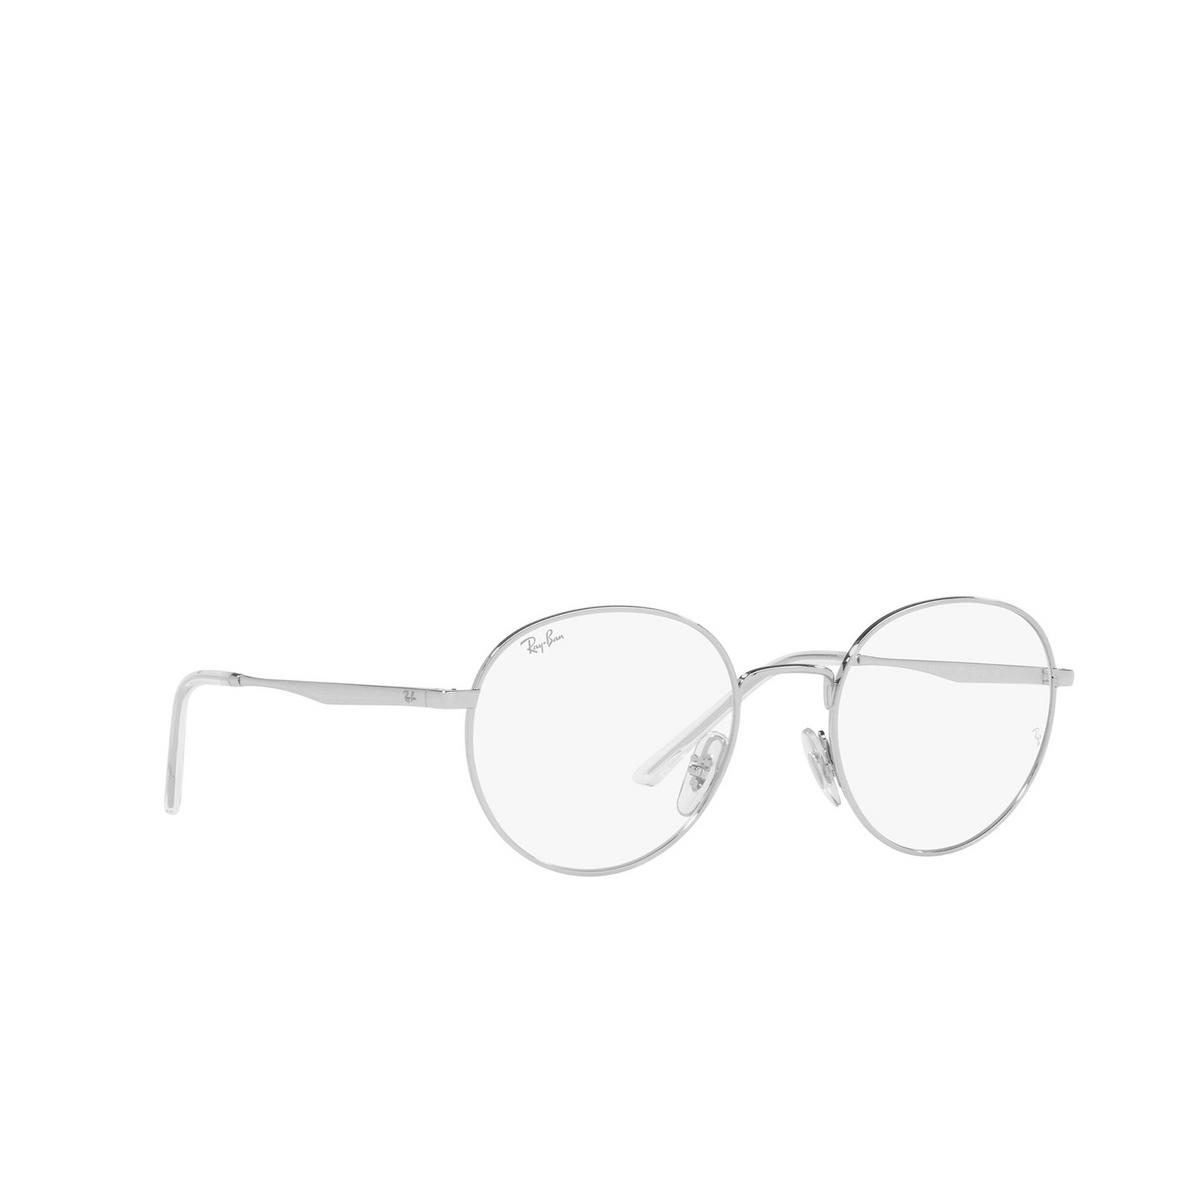 Ray-Ban® Round Eyeglasses: RX3681V color Silver 2501 - three-quarters view.